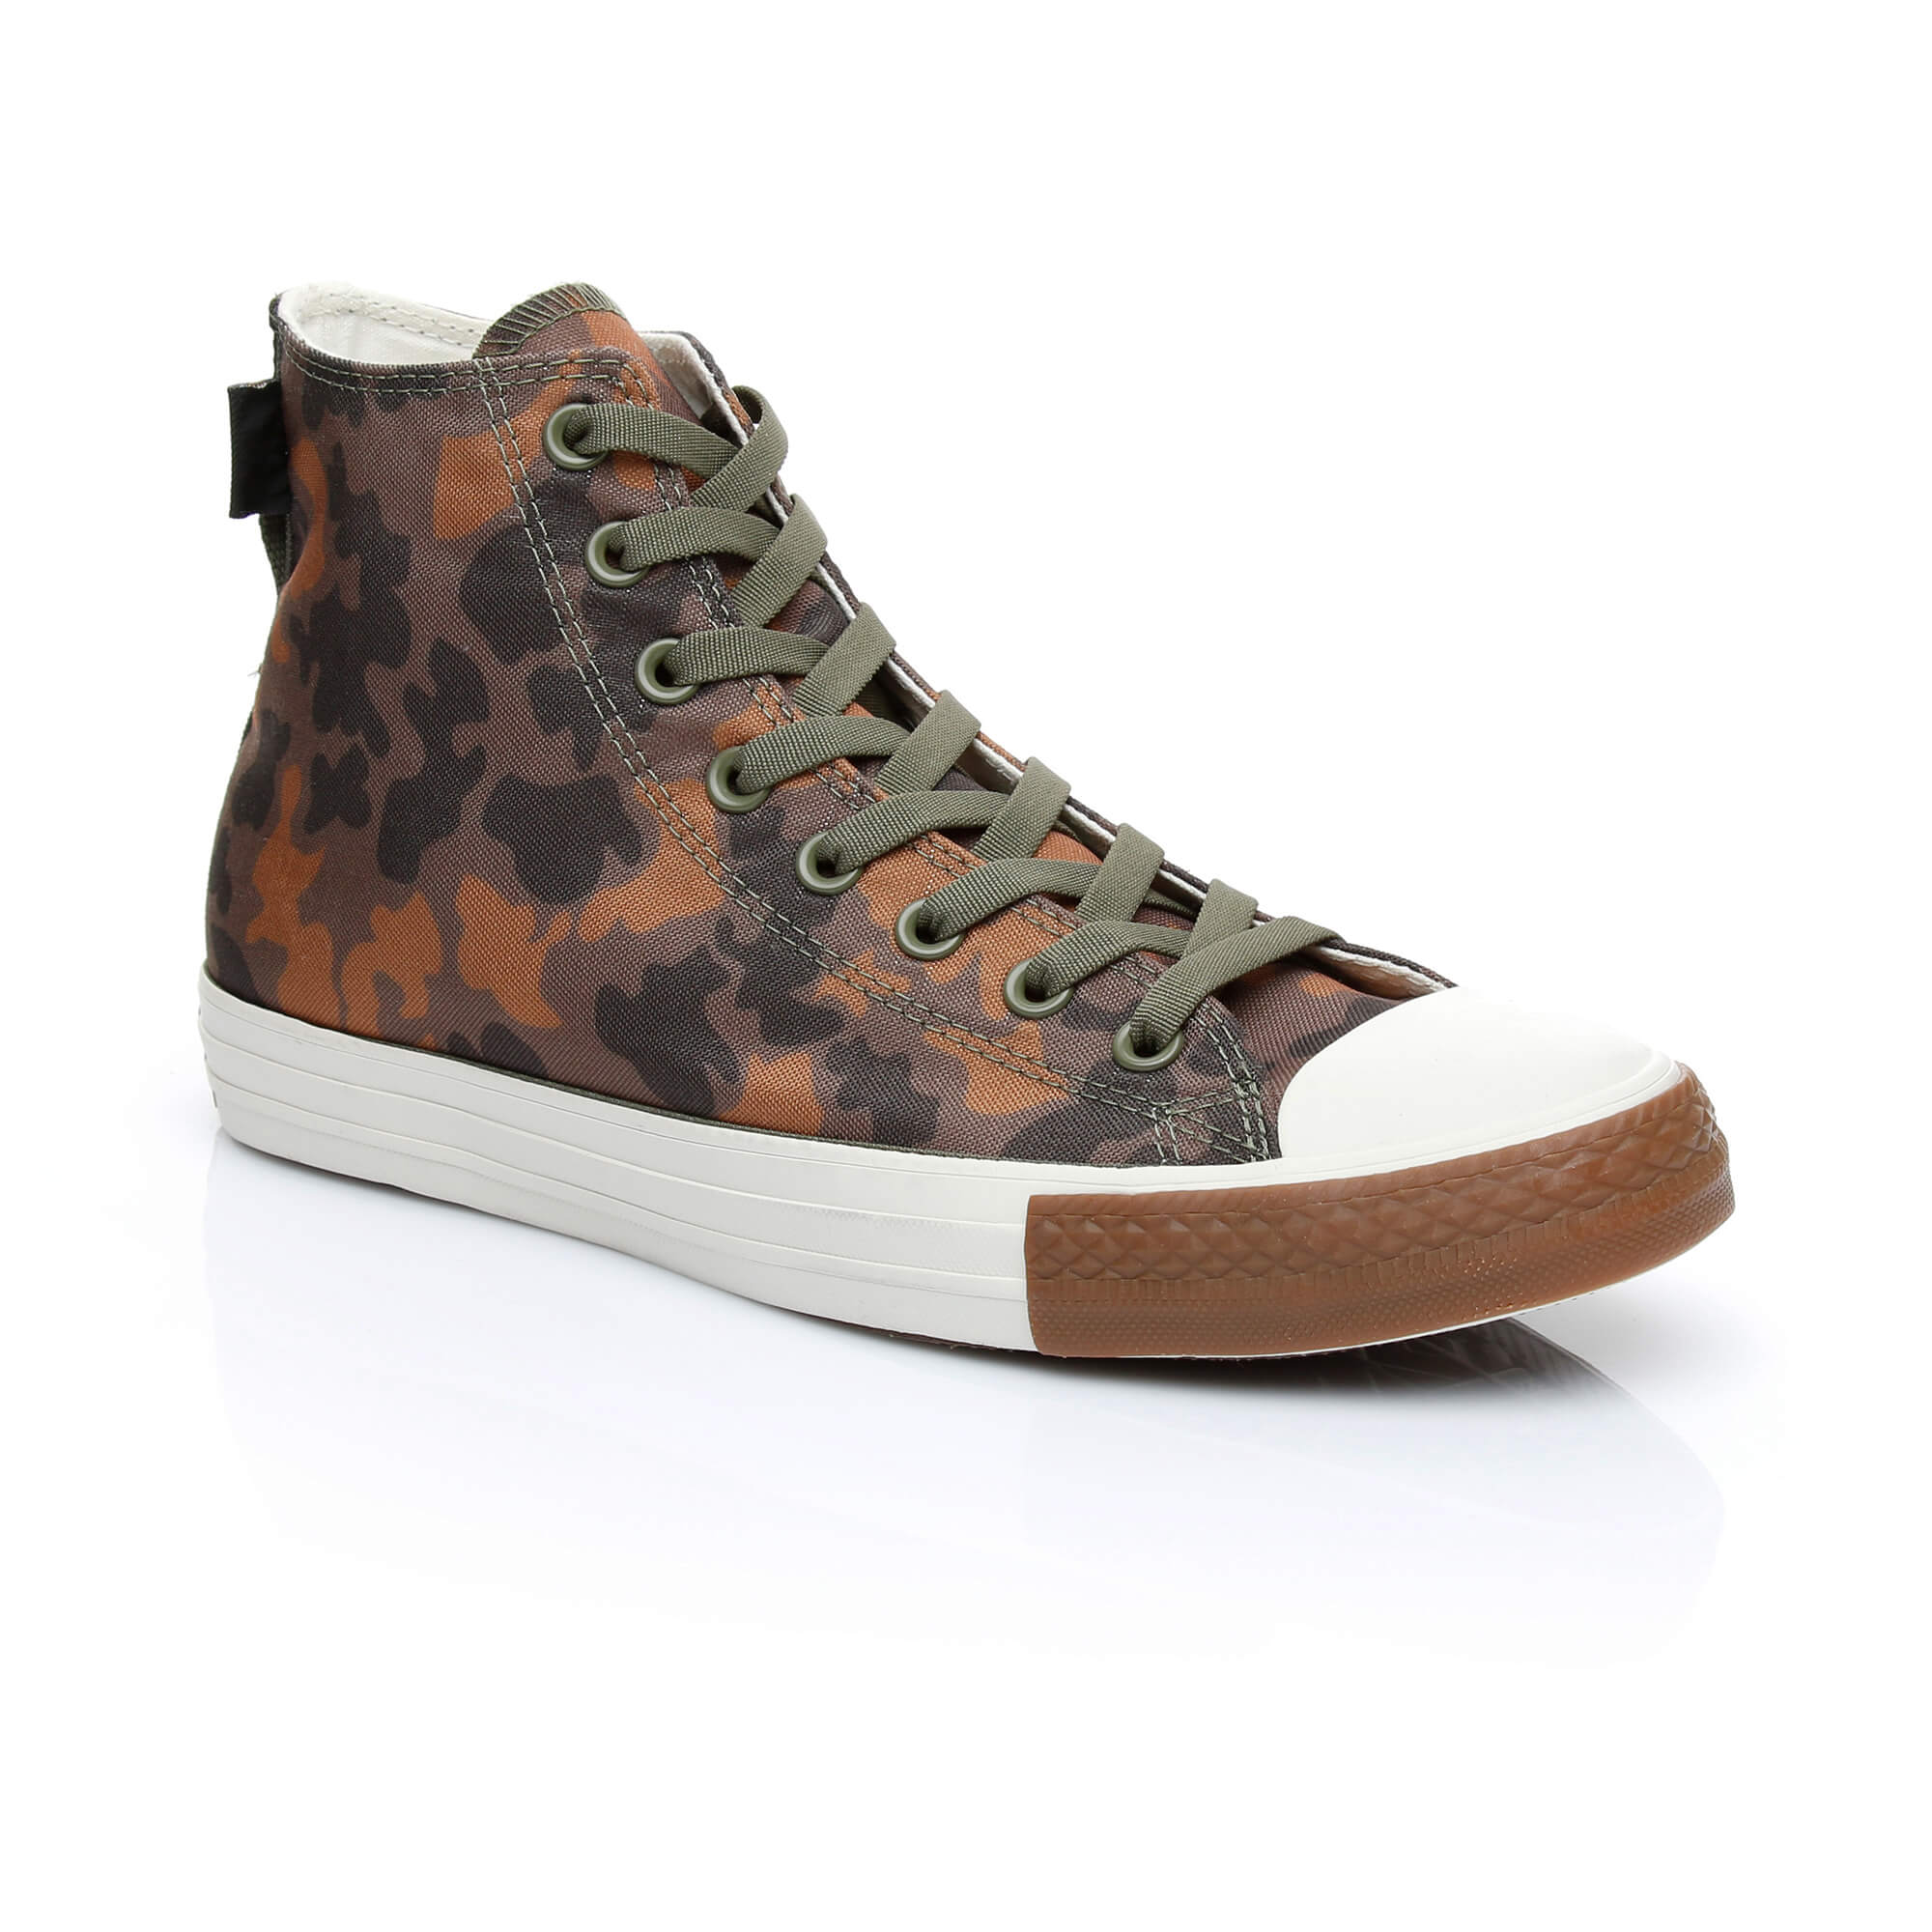 Converse Chuck Taylor All Star Mid Erkek Kahverengi Sneaker